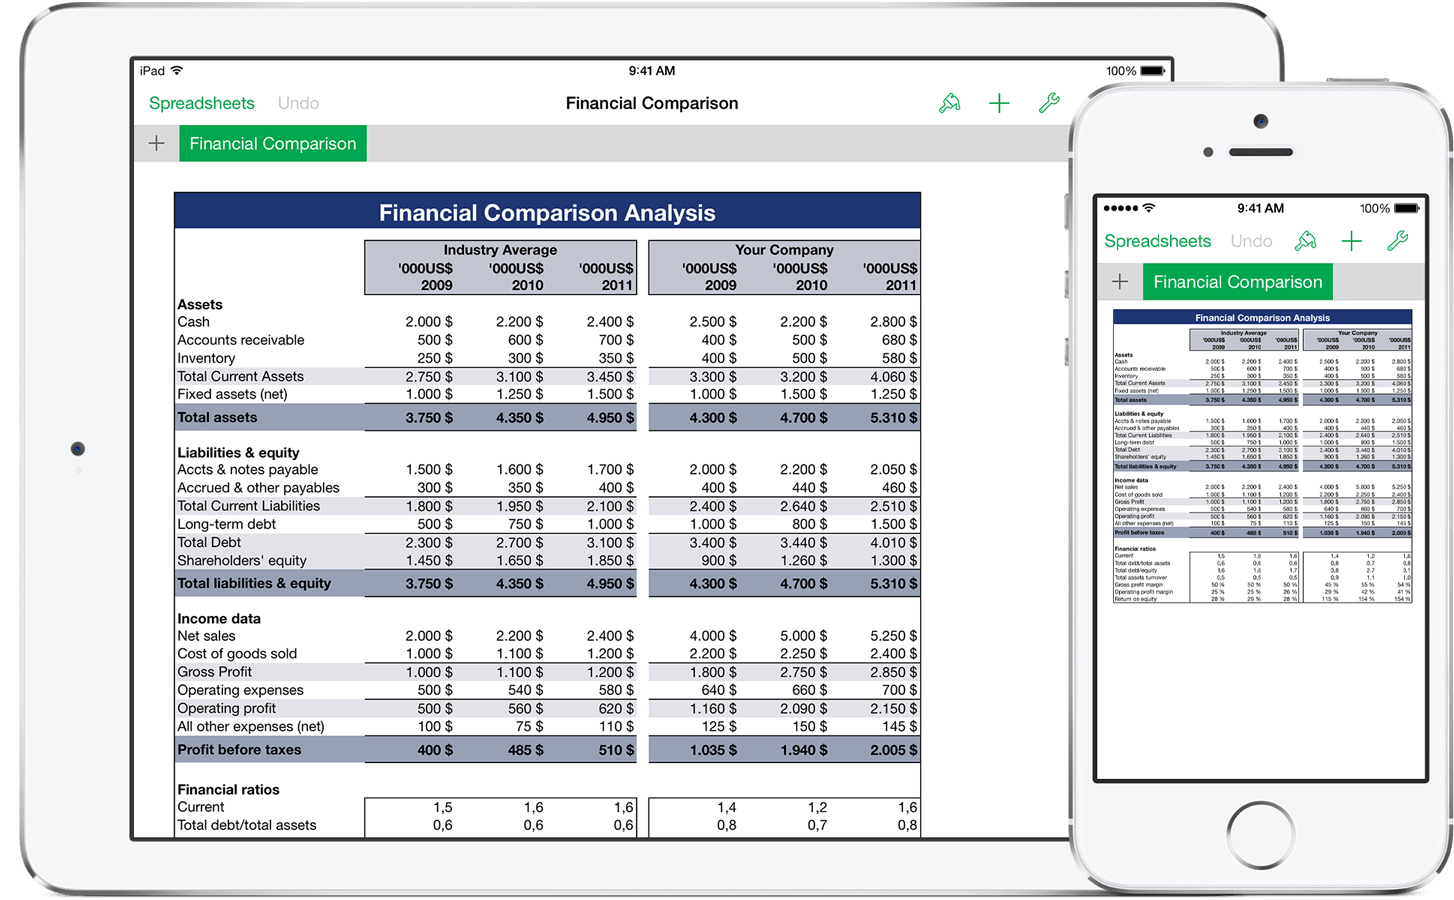 Free Spreadsheet For Ipad Inside Free Spreadsheet For Ipad  Aljererlotgd